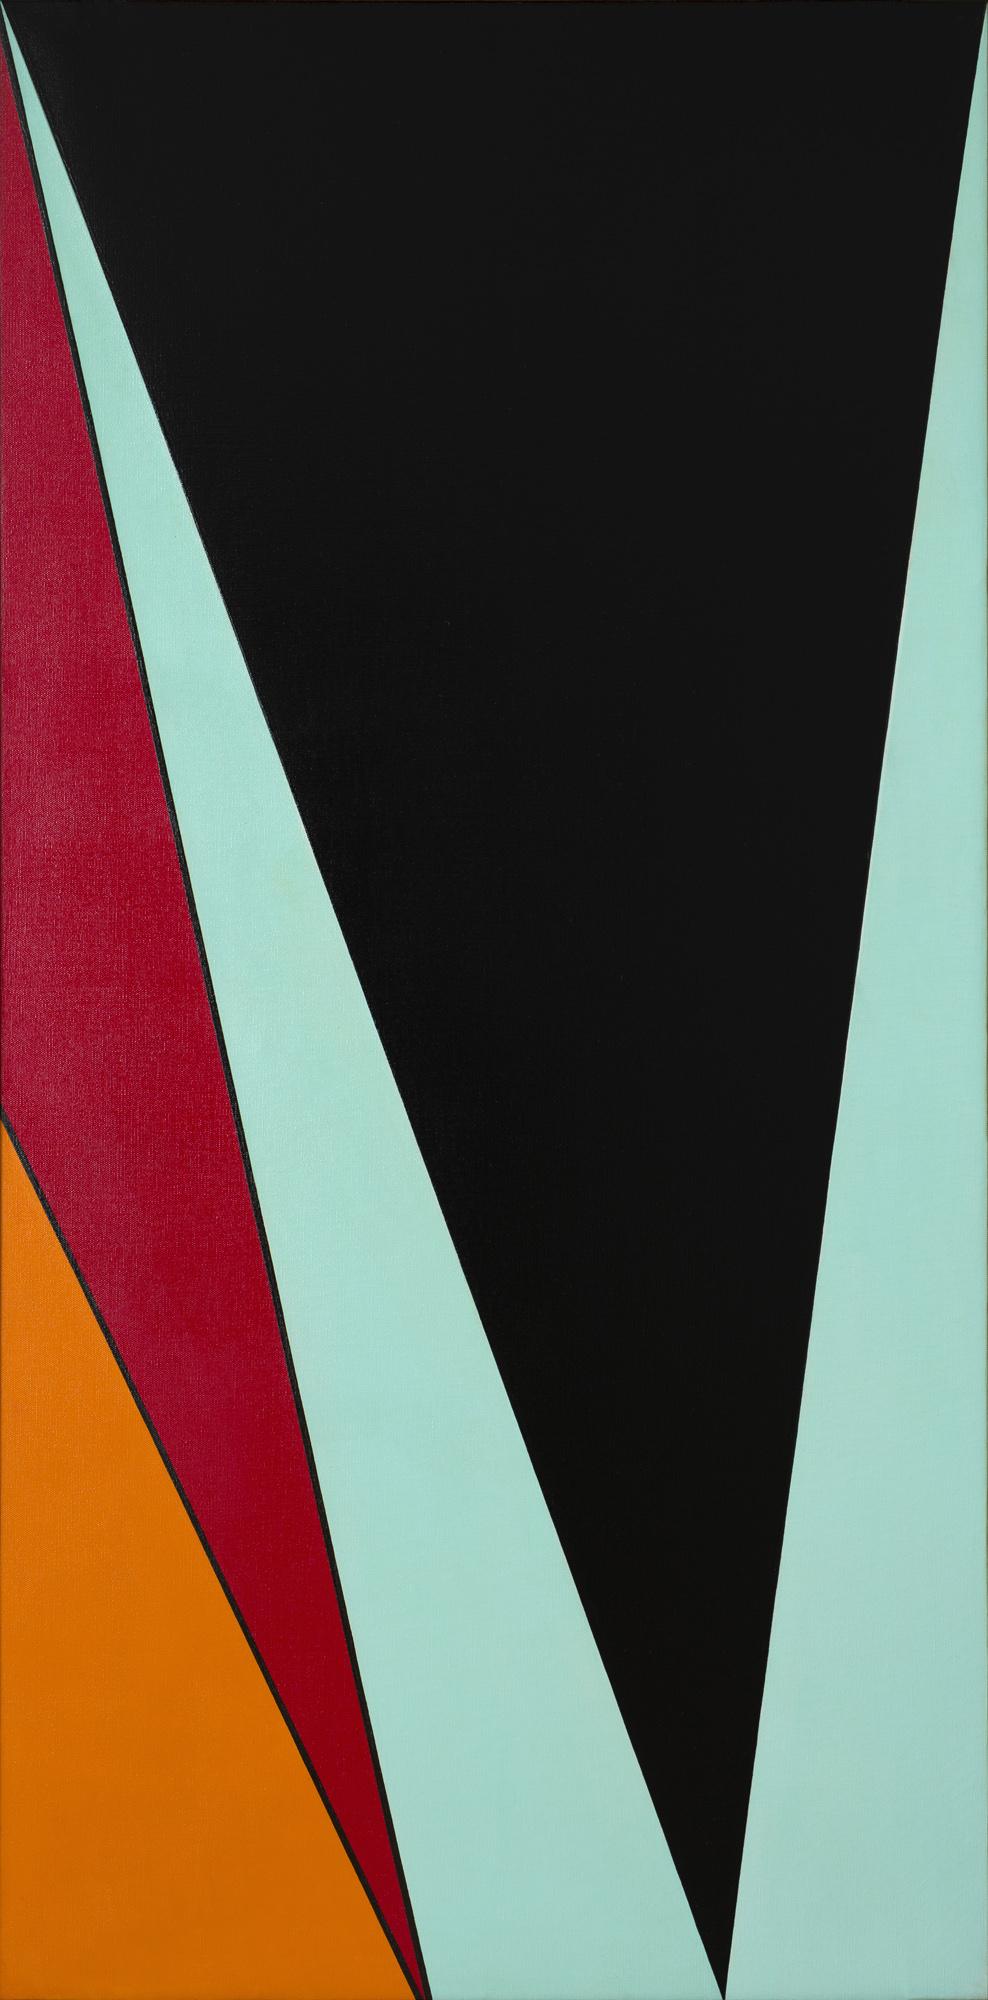 Olle Baertling   Oga  1960 Oil on canvas 195 x 97 cm